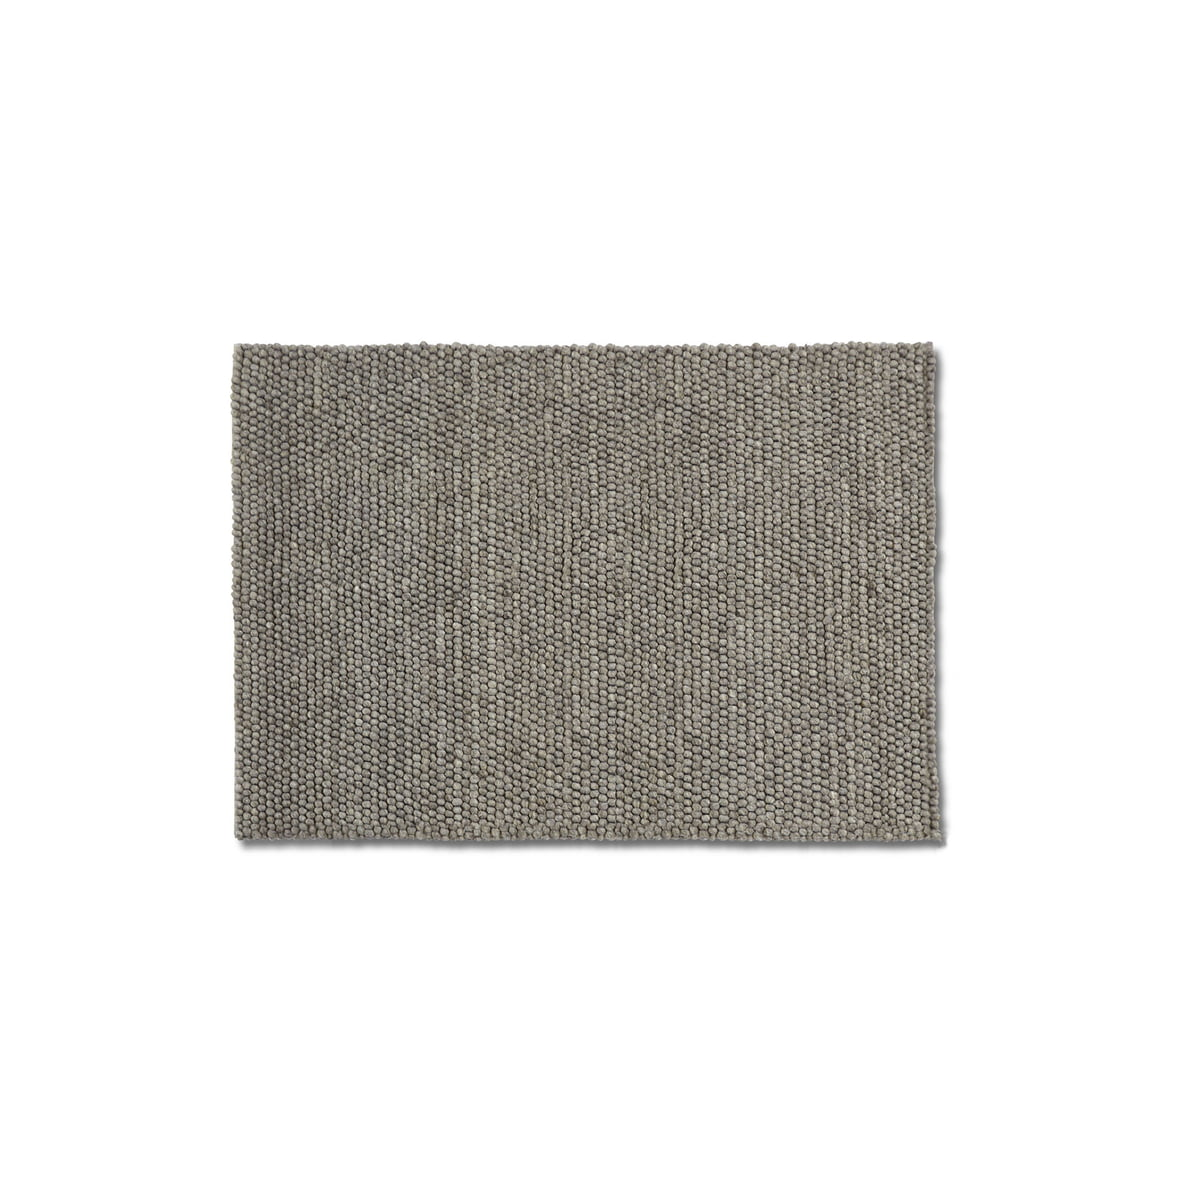 Schon Hay   Peas Teppich 80 X 140 Cm In Medium Grey